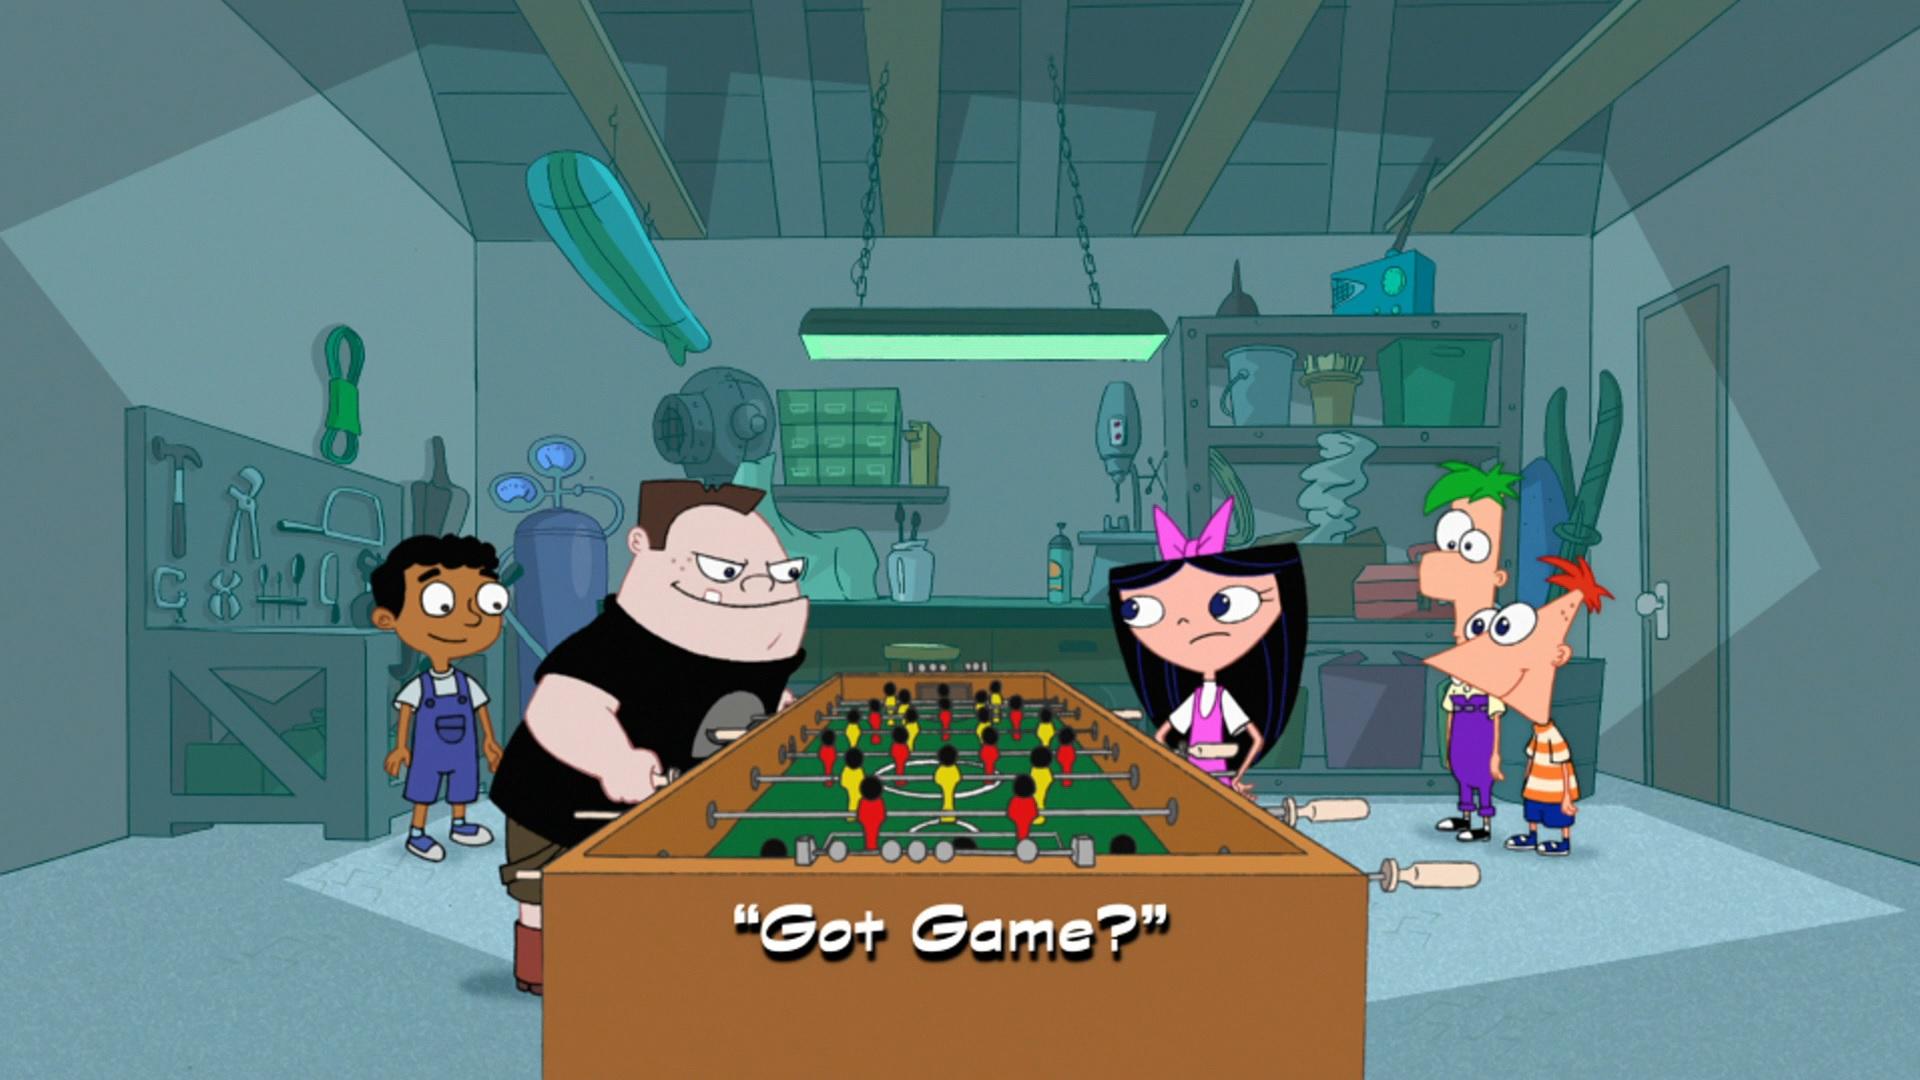 File:Got Game? title card.jpg